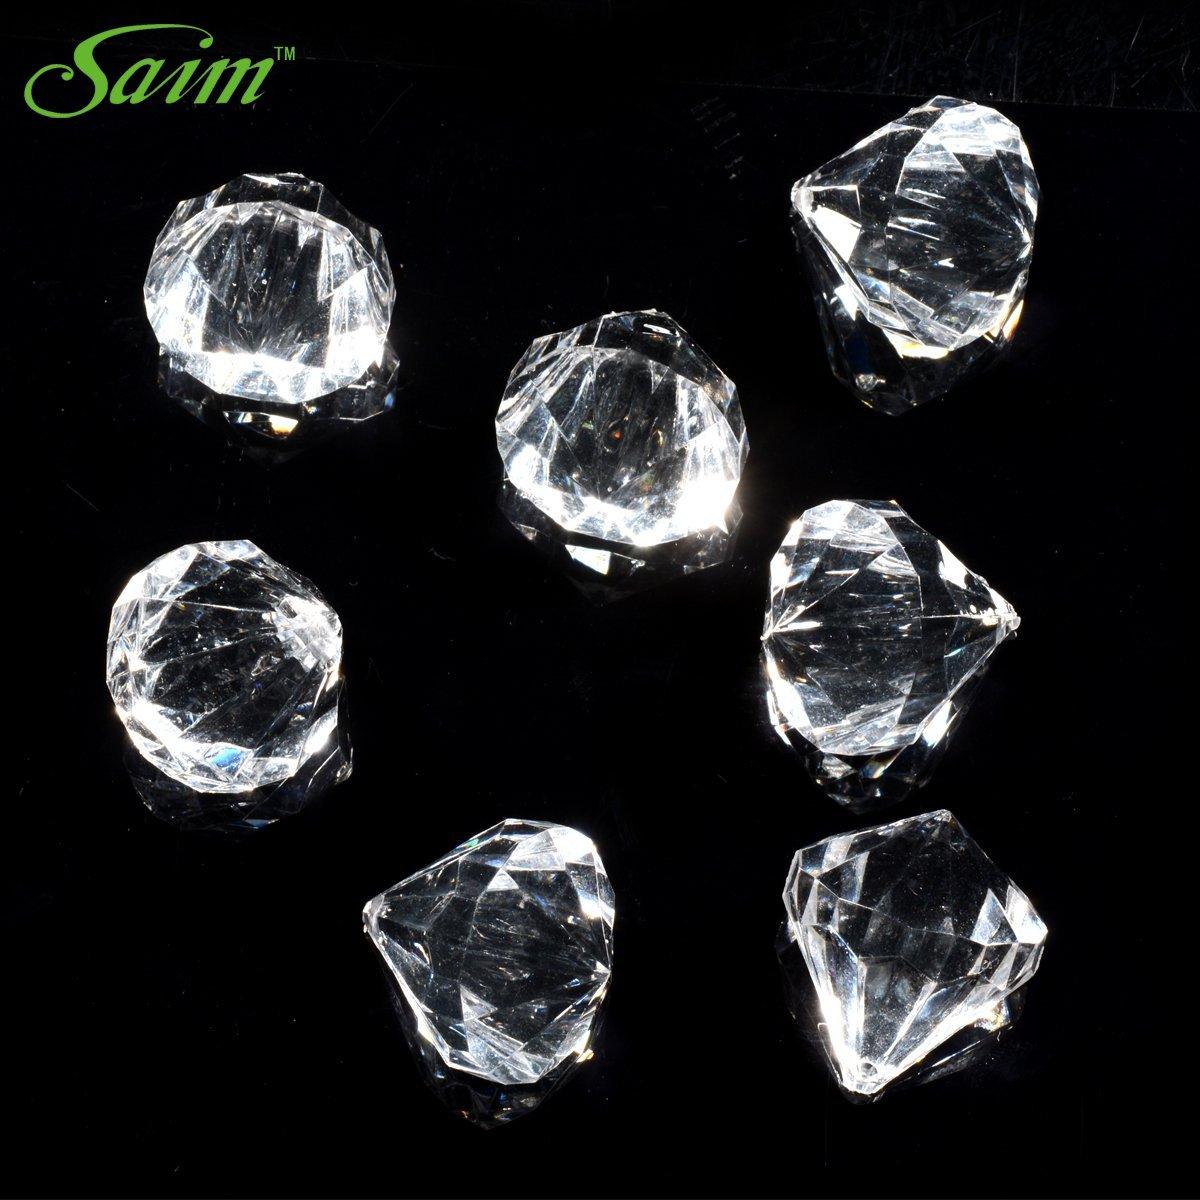 Saim 1 Pound 100 Pcs 20 Carat Clear Acrylic Diamonds - Big Diamonds for Table Centerpiece Decorations, Wedding Decorations, Bridal Shower Decorations